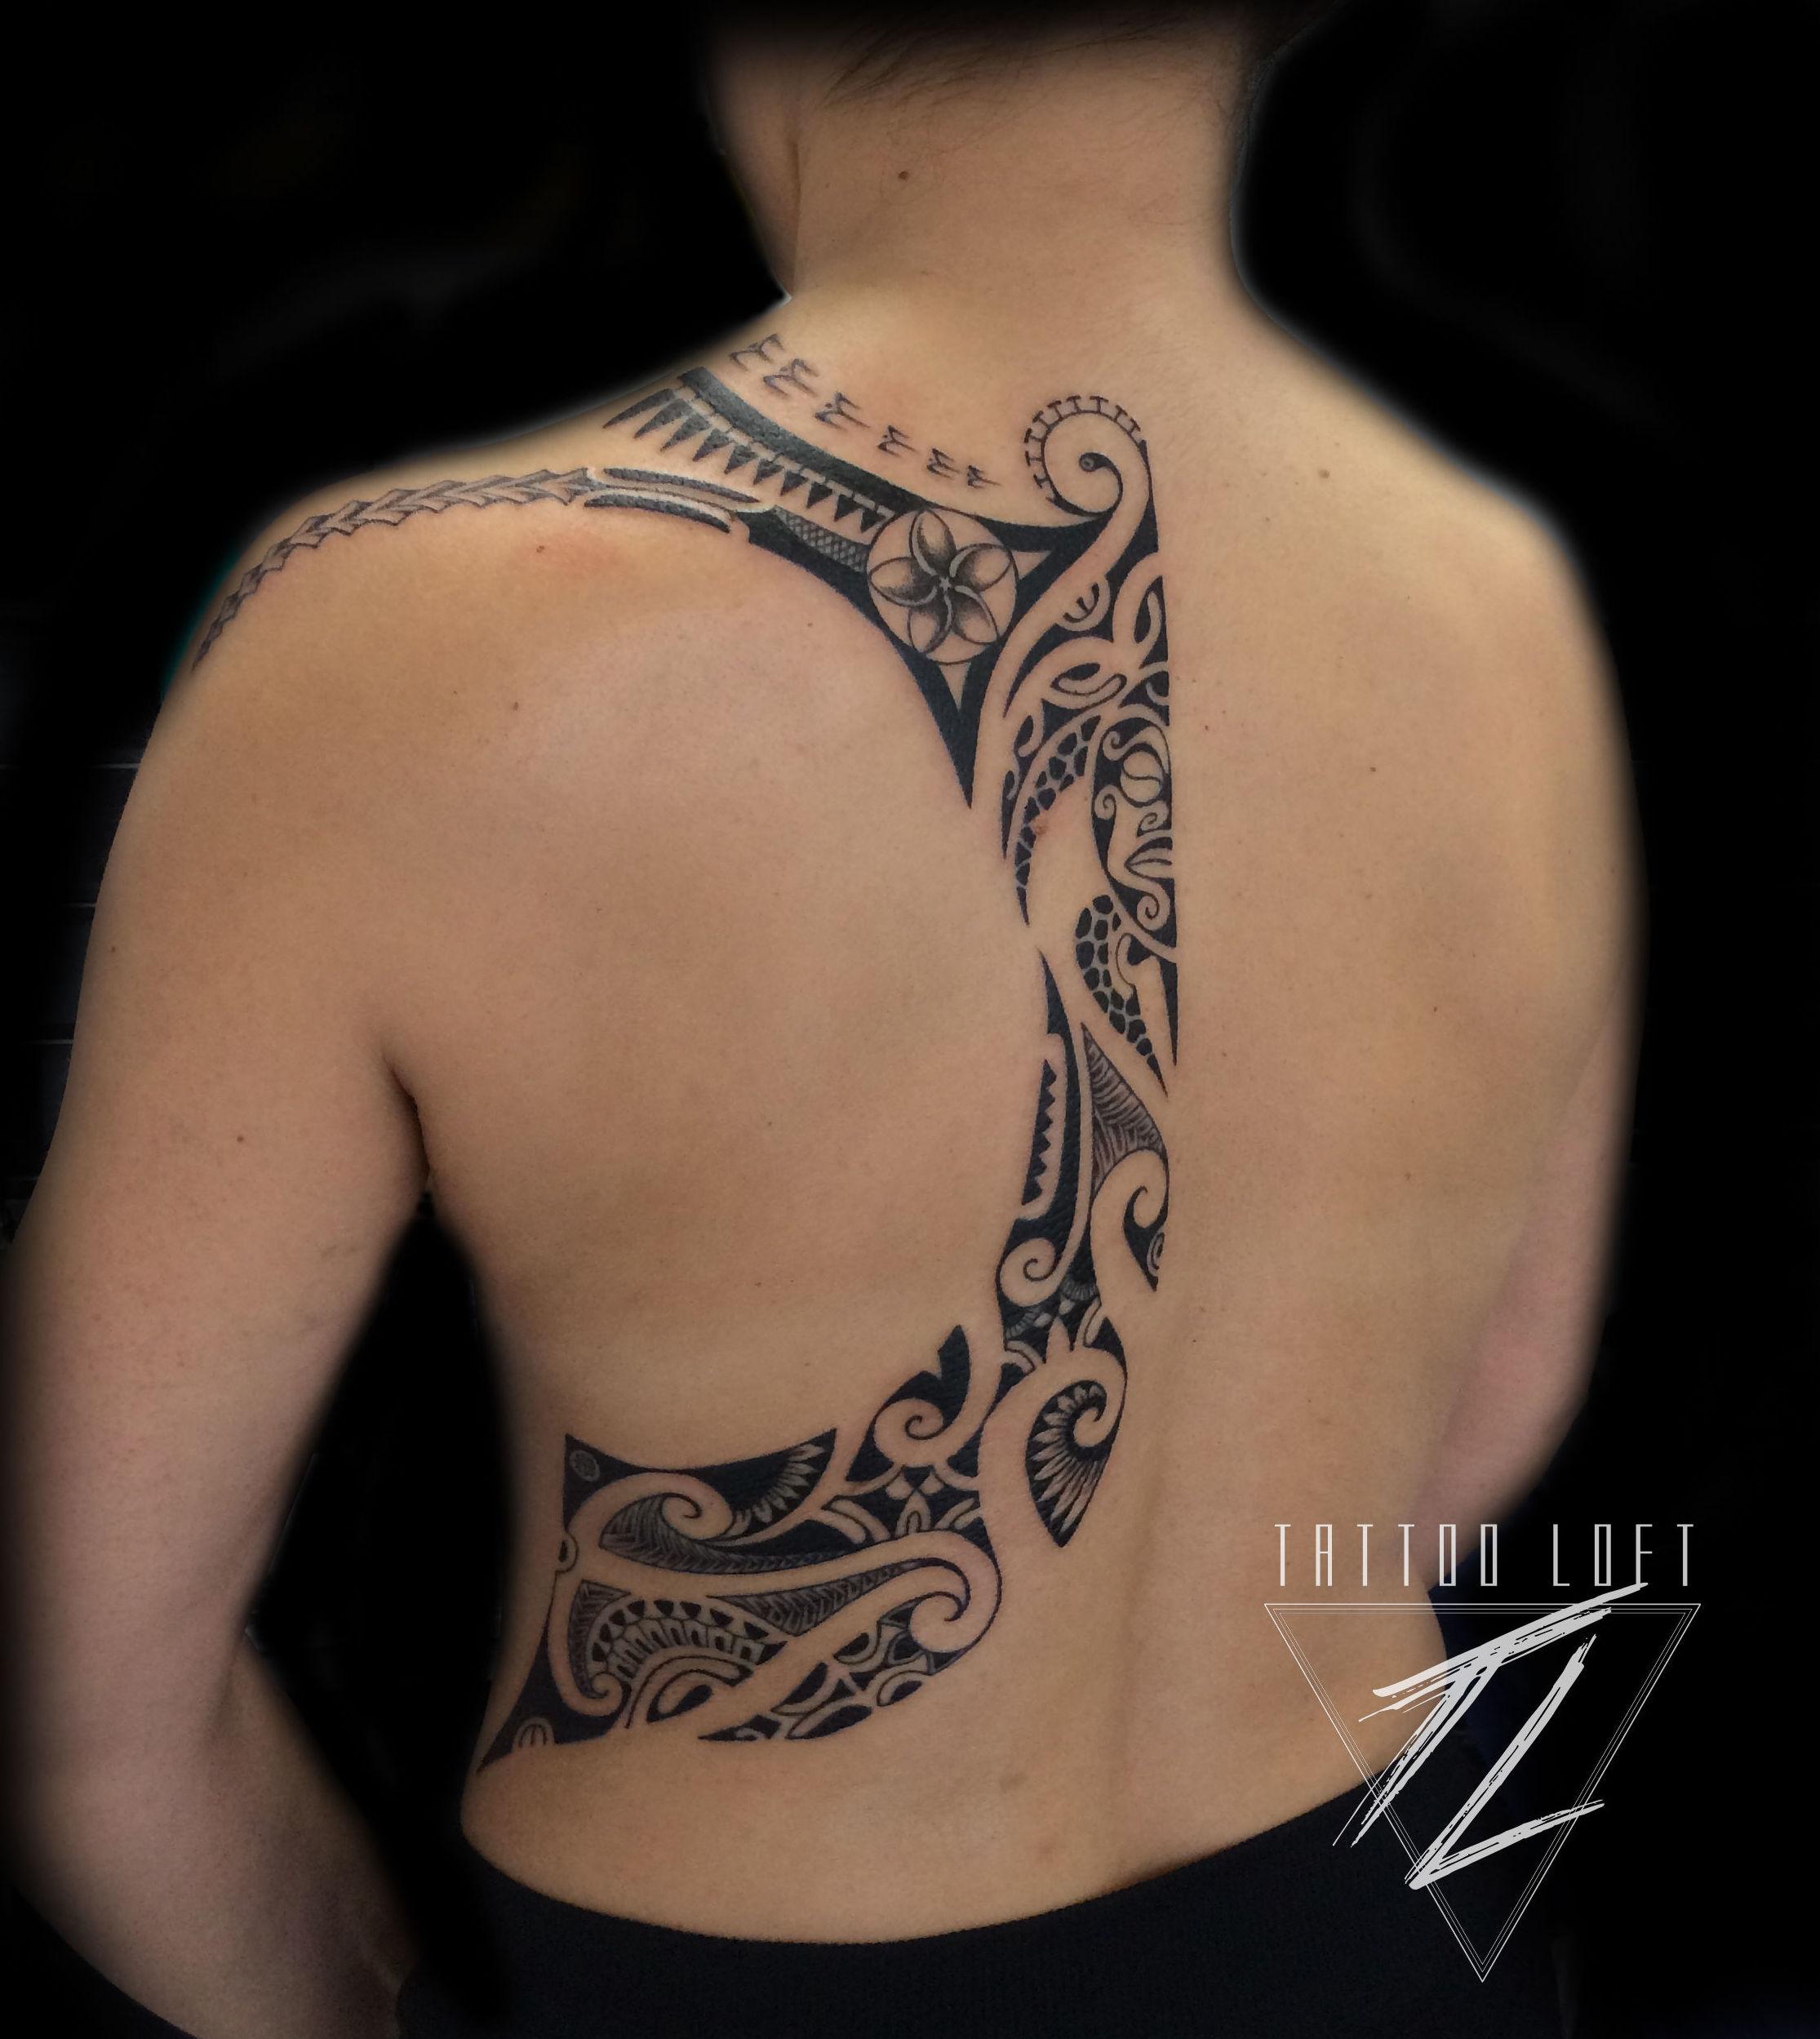 Foto 79 de Estudio artístico de tatuaje en  | Tattoo Loft